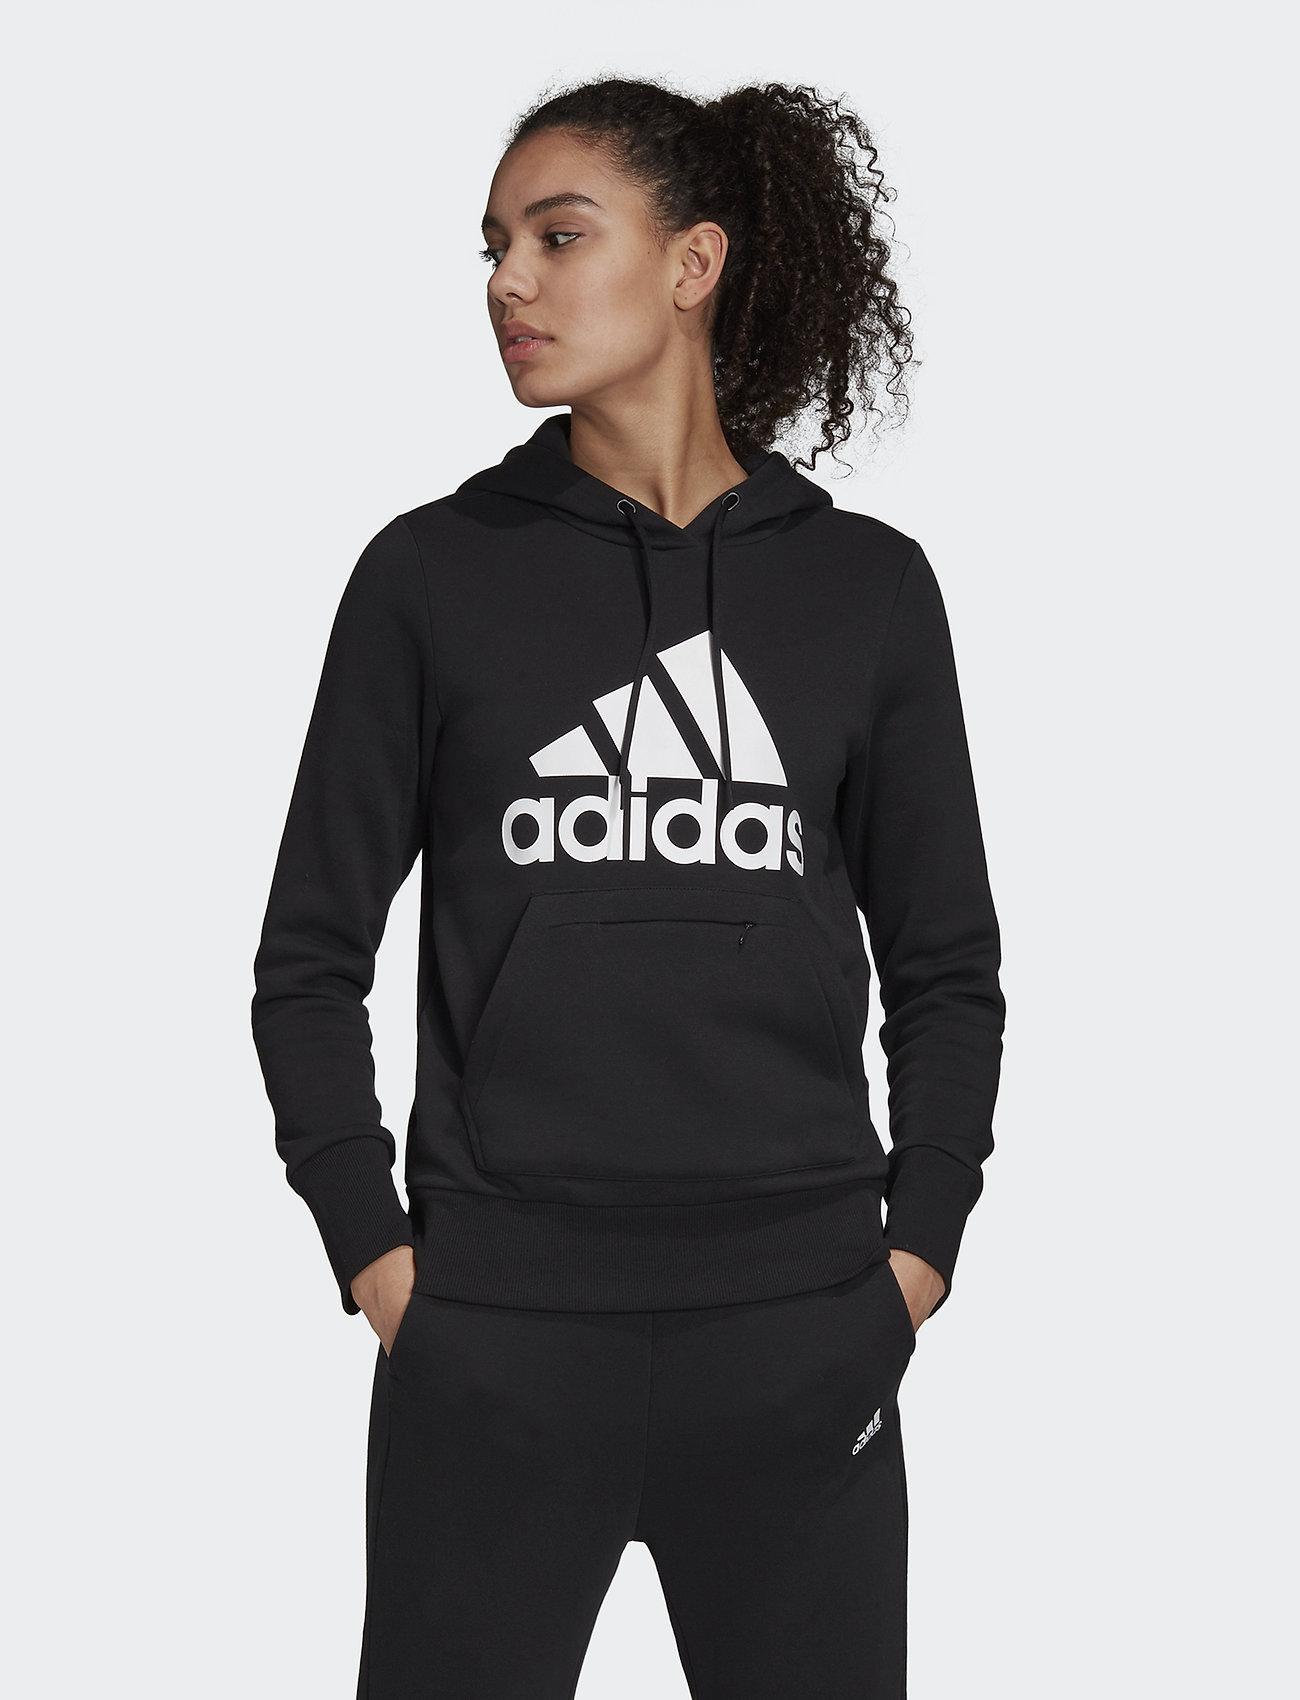 adidas Performance - W BOS OH HD - hupparit - black - 0